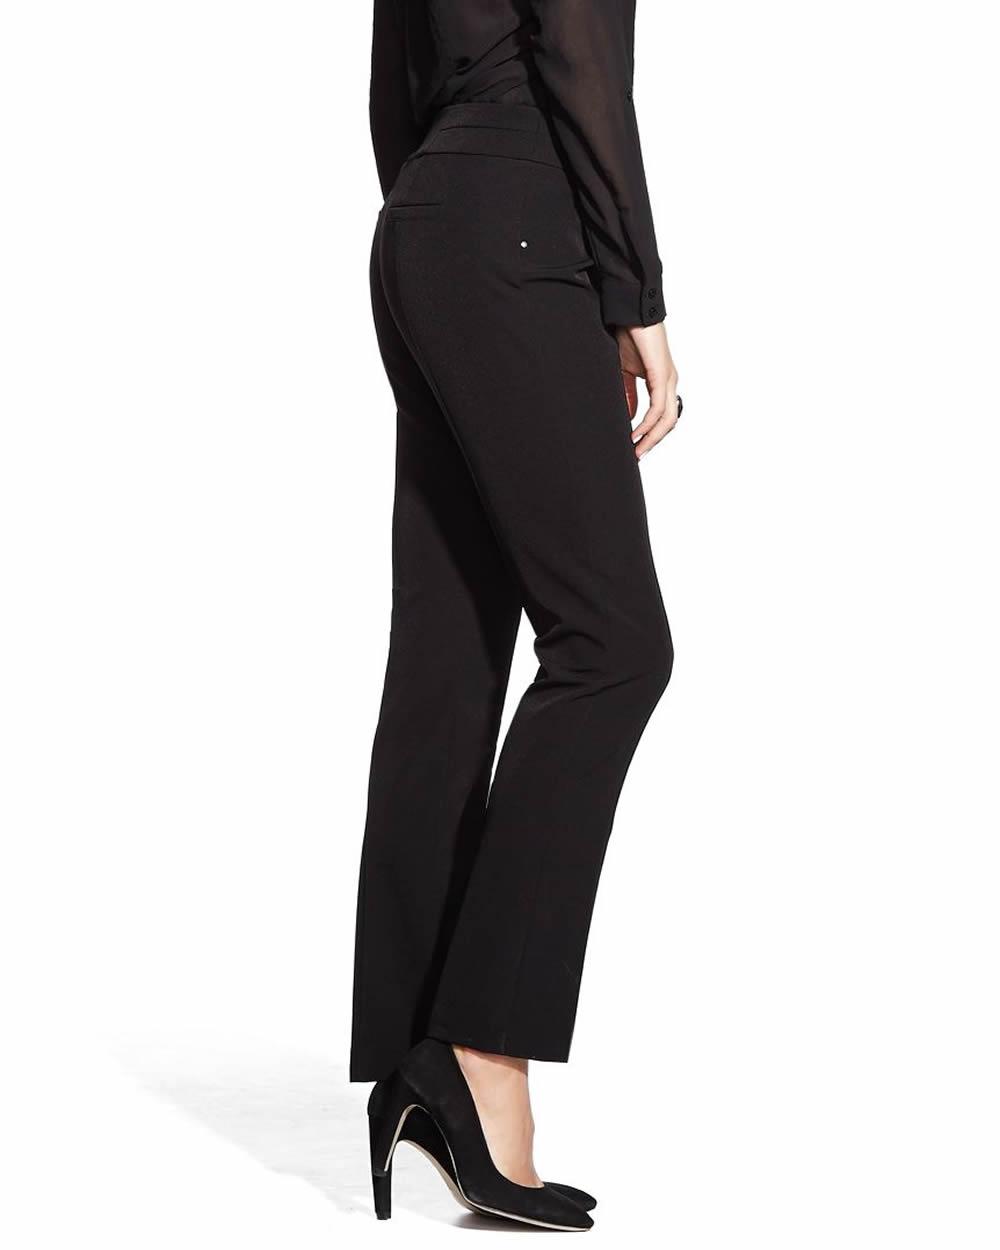 Straight Leg Dress Pants For Women | Gpant